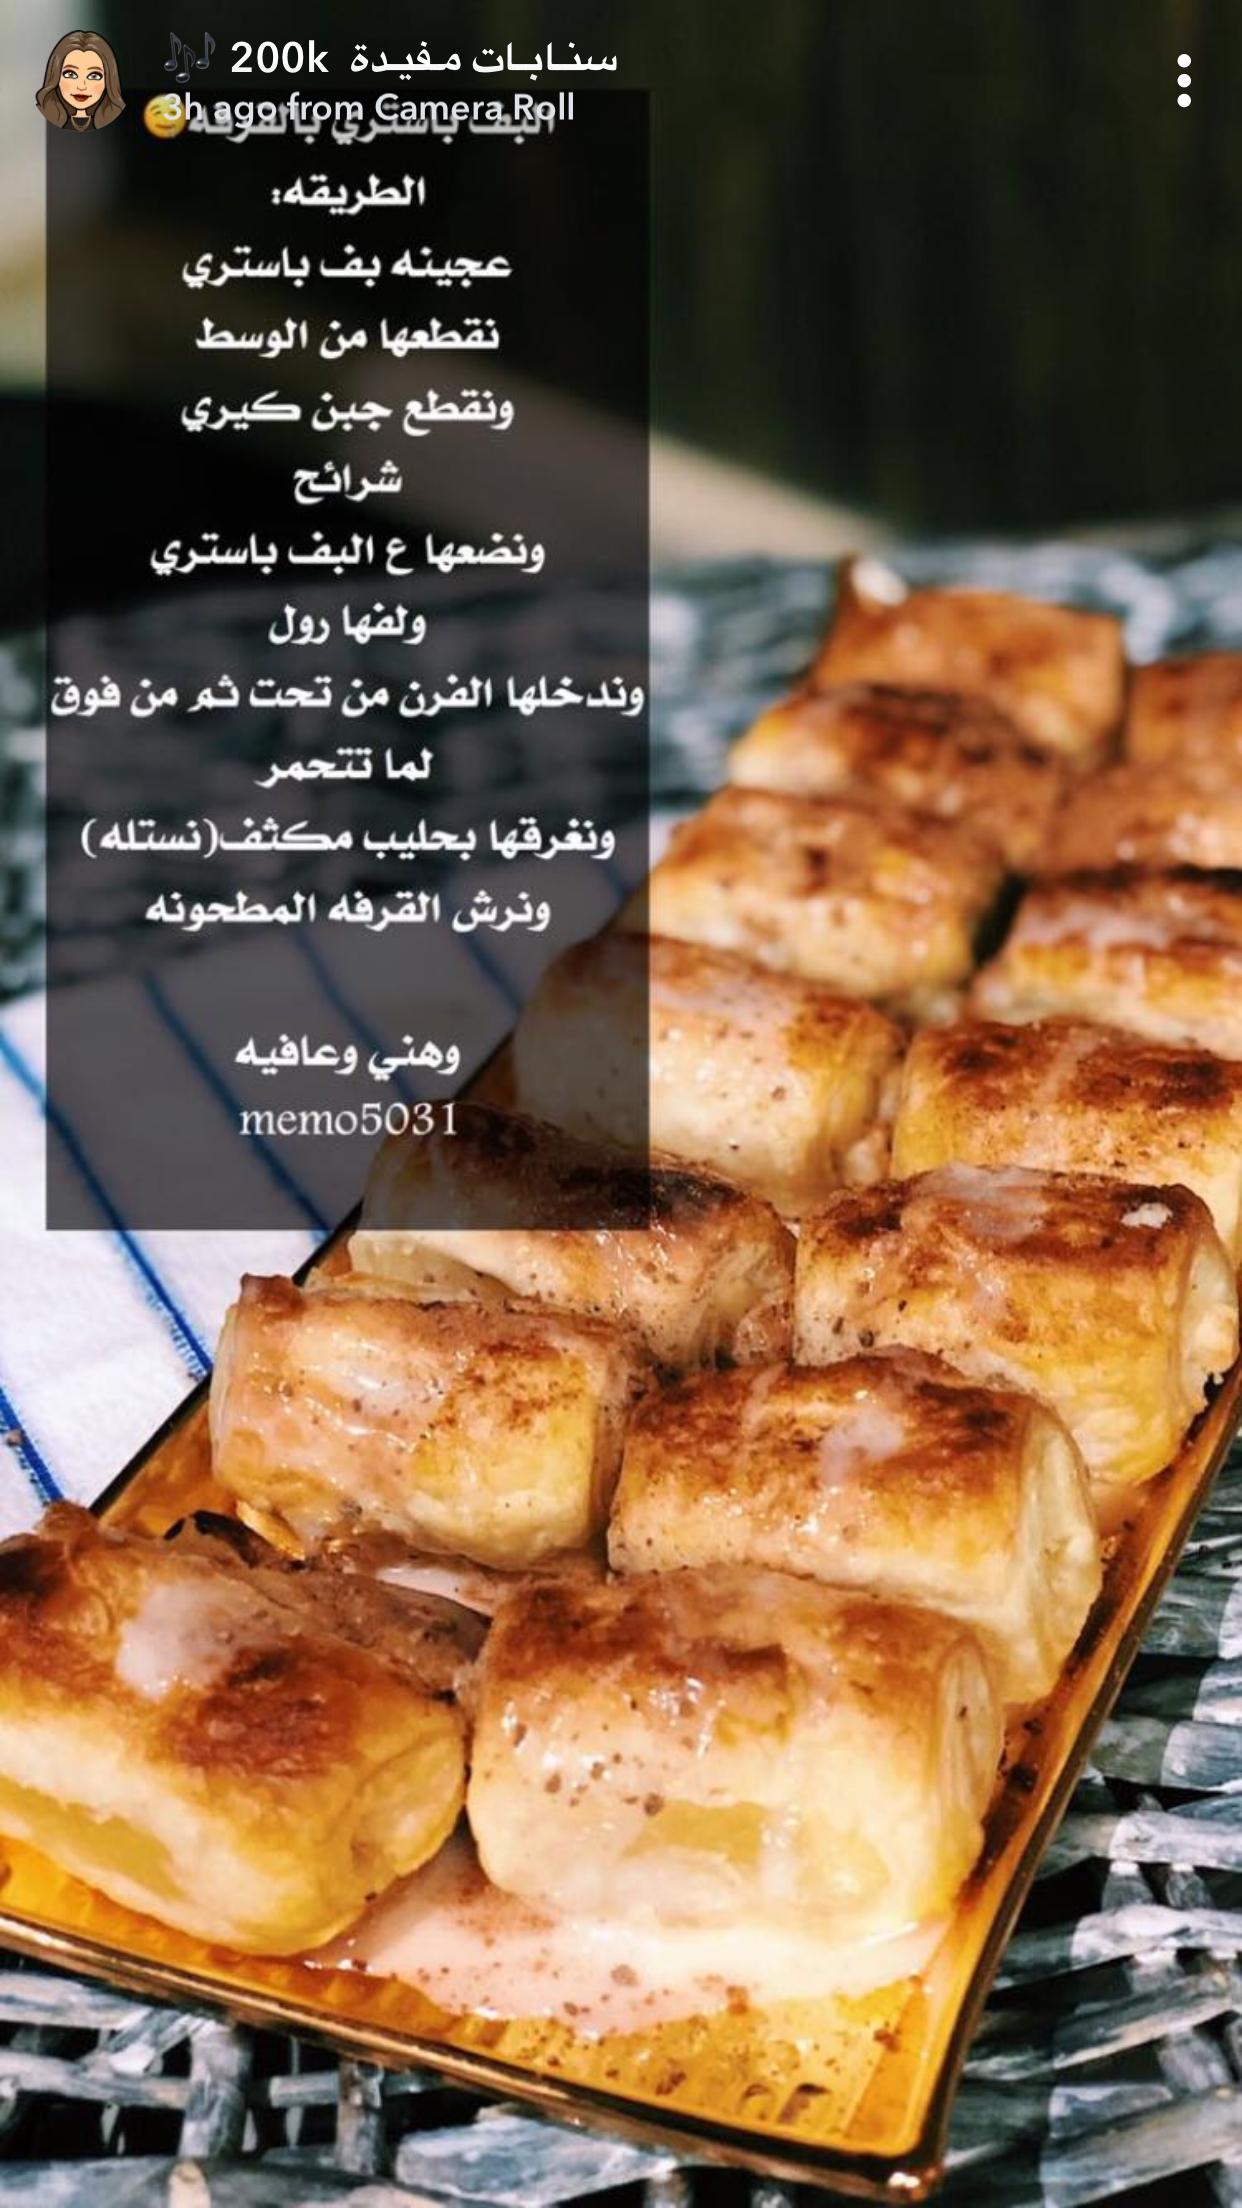 Pin By Sura Adnan On طبخات Food Drinks Dessert Yummy Food Dessert Diy Food Recipes